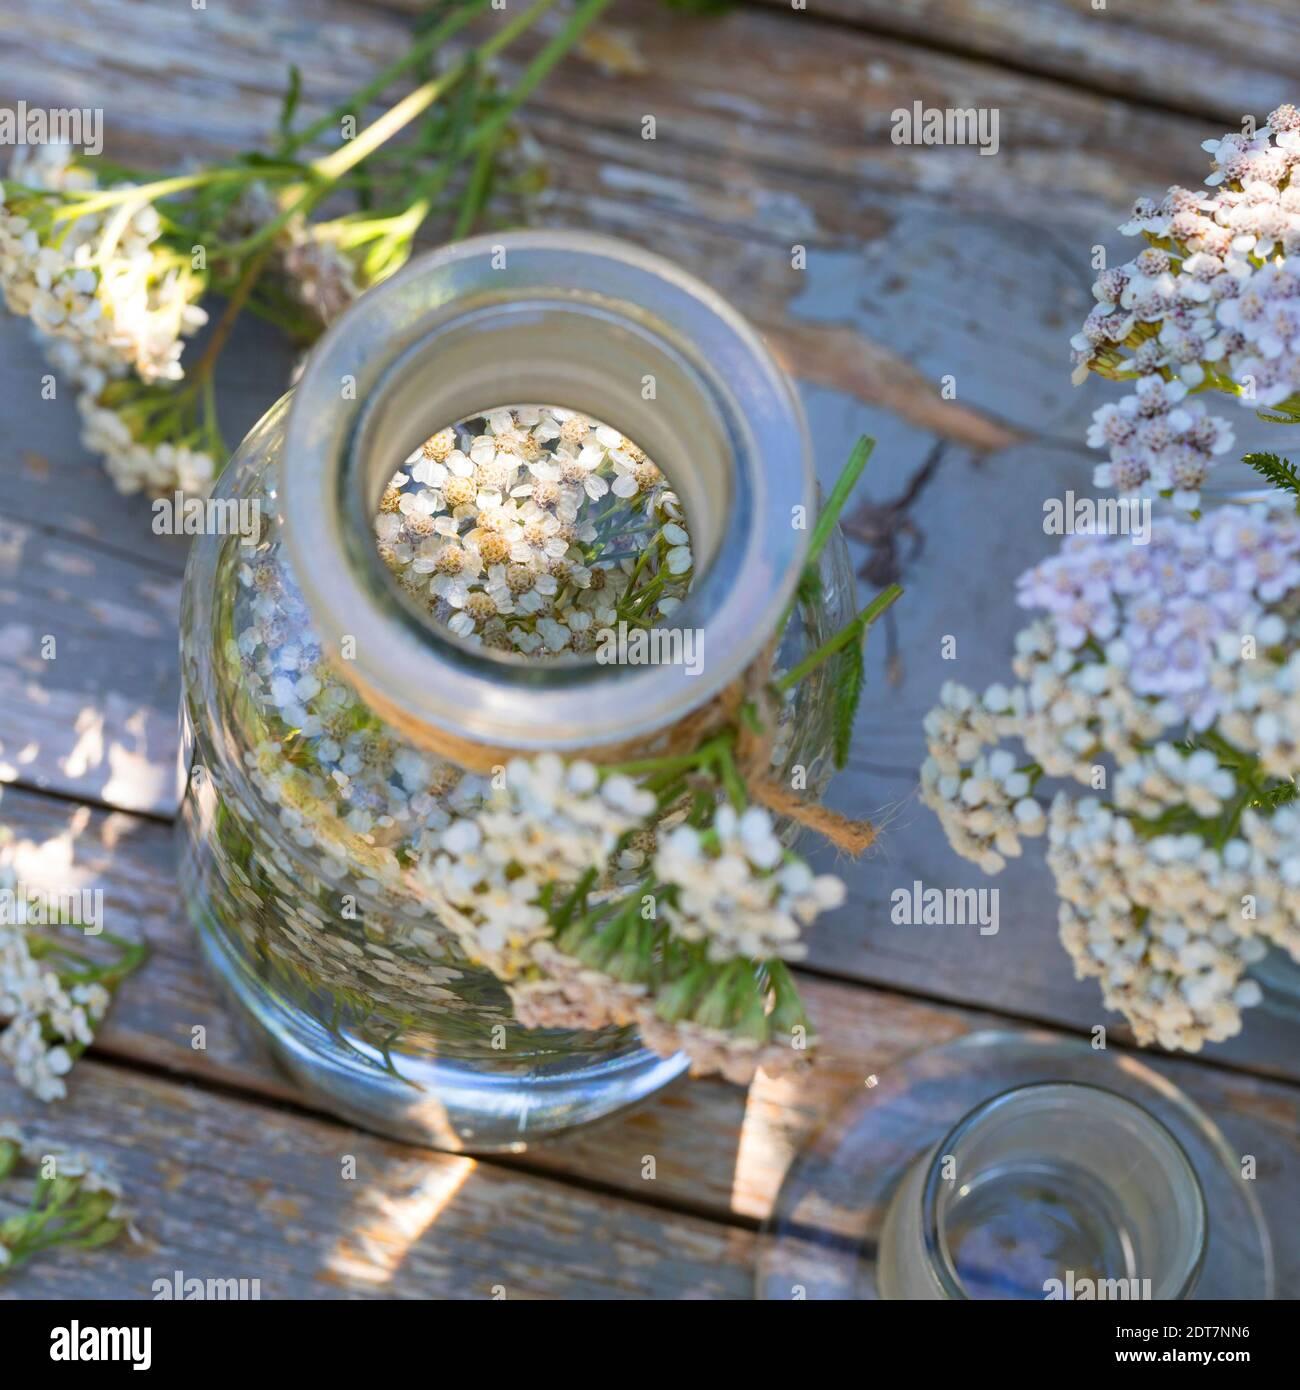 Yarrow común, milfoil (Achillea millefolium), tintura de yarrow auto-hecha, Alemania Foto de stock